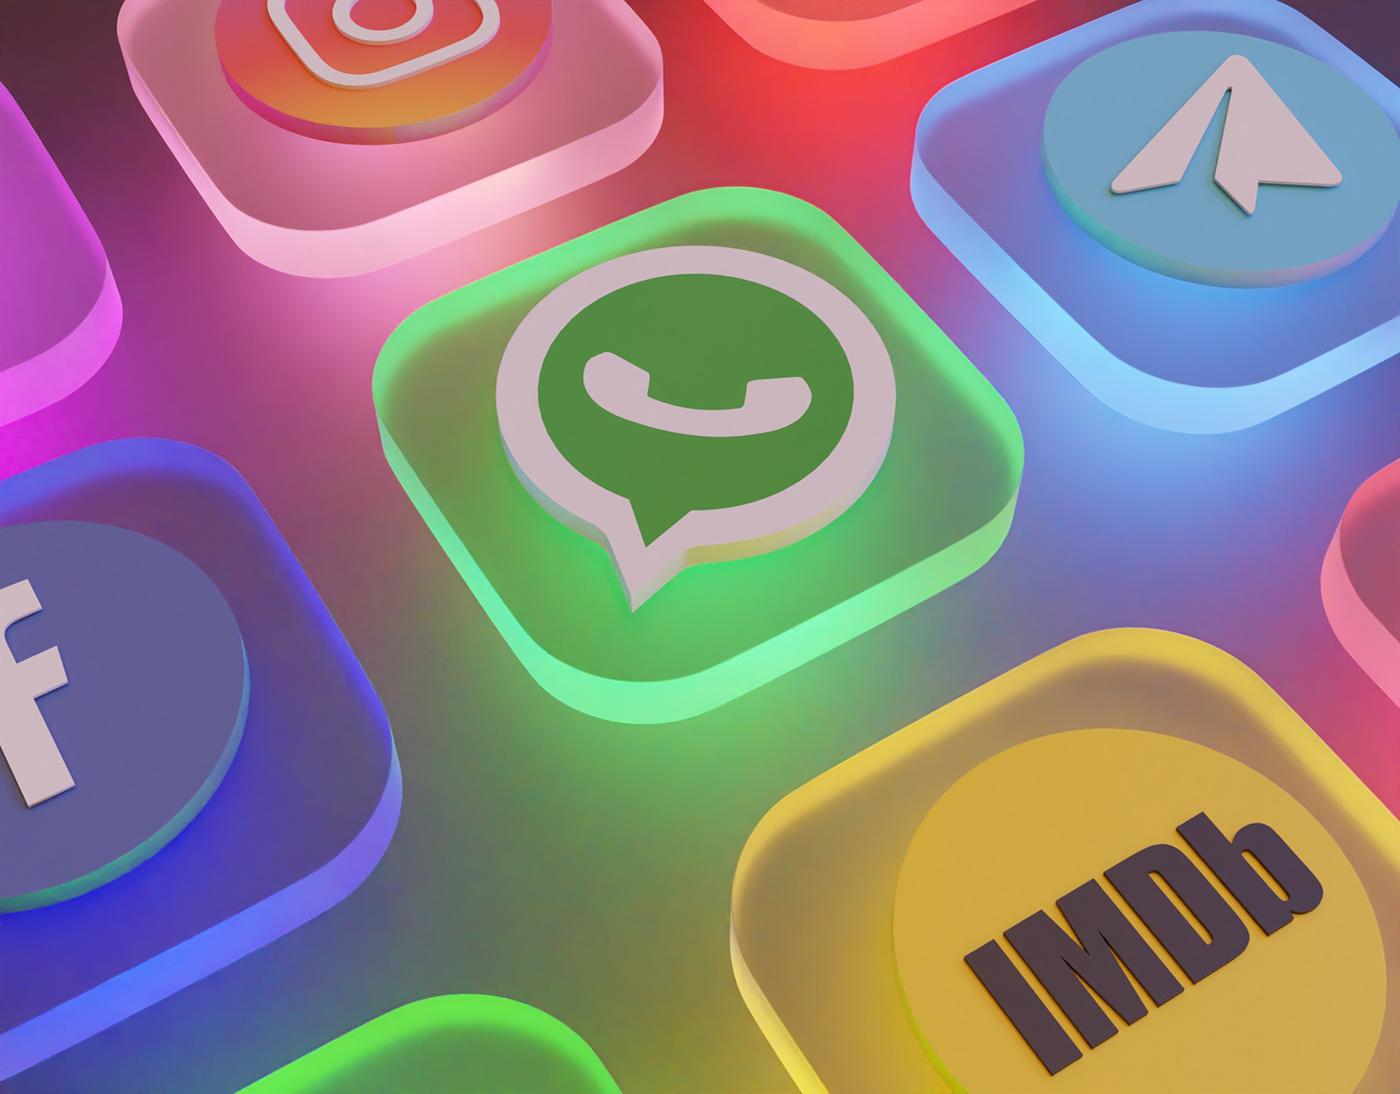 3d icons,3D model,app icons,armin khorsandipour,blender,icons,telegram icon,WhatsApp